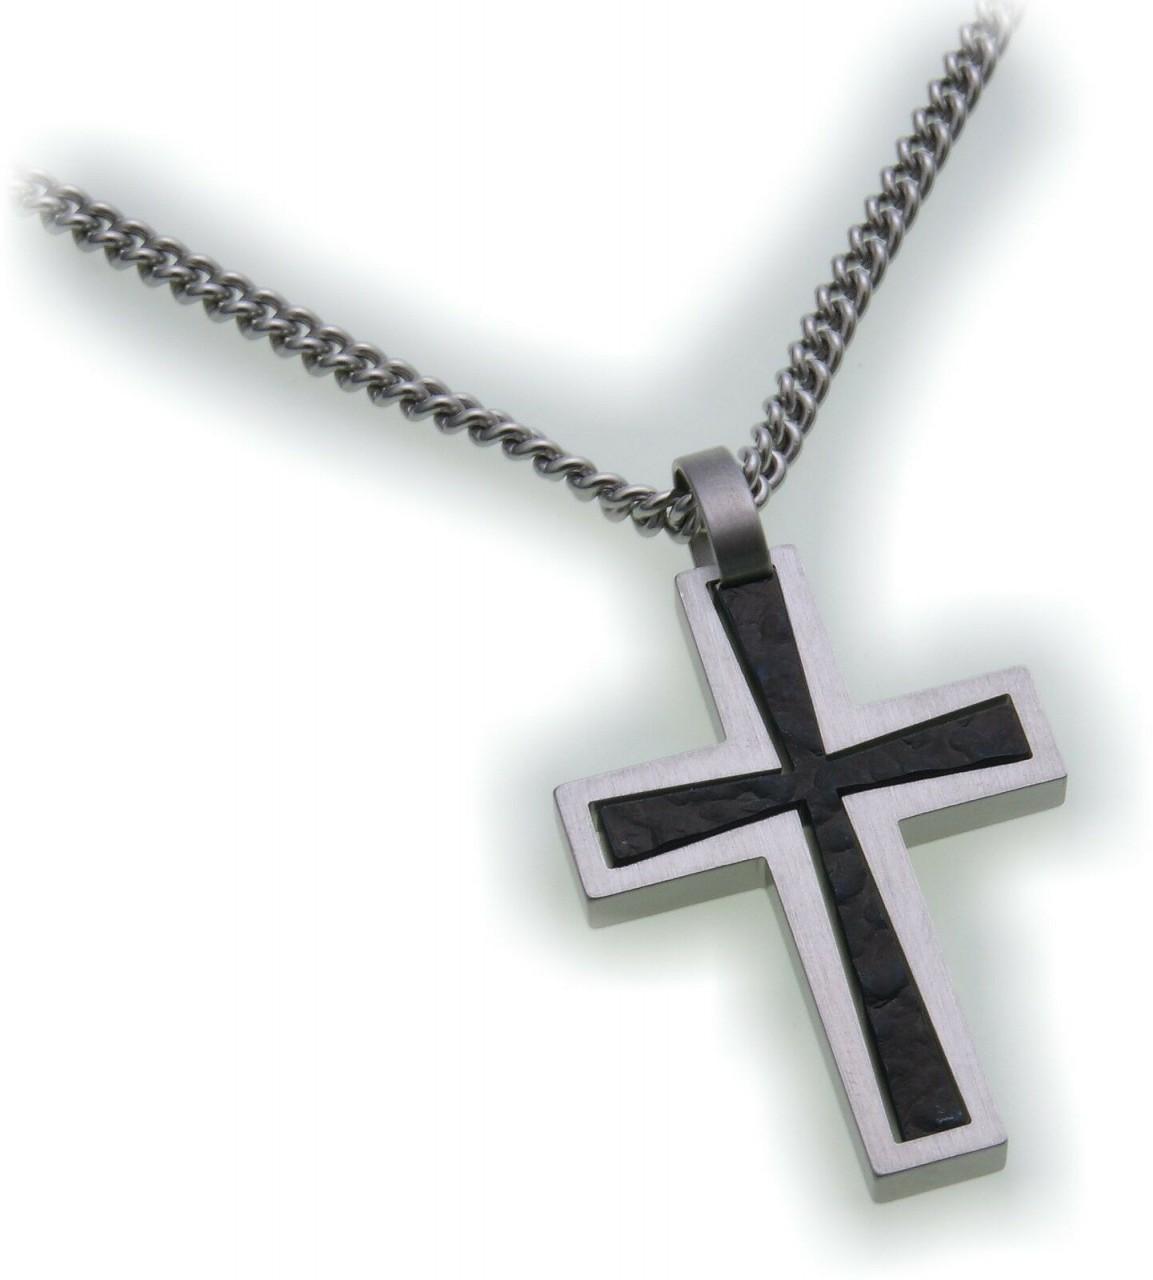 Neu Anhänger Kreuz aus Edelstahl mattiert und schwarz IBP beschichtet Adamo